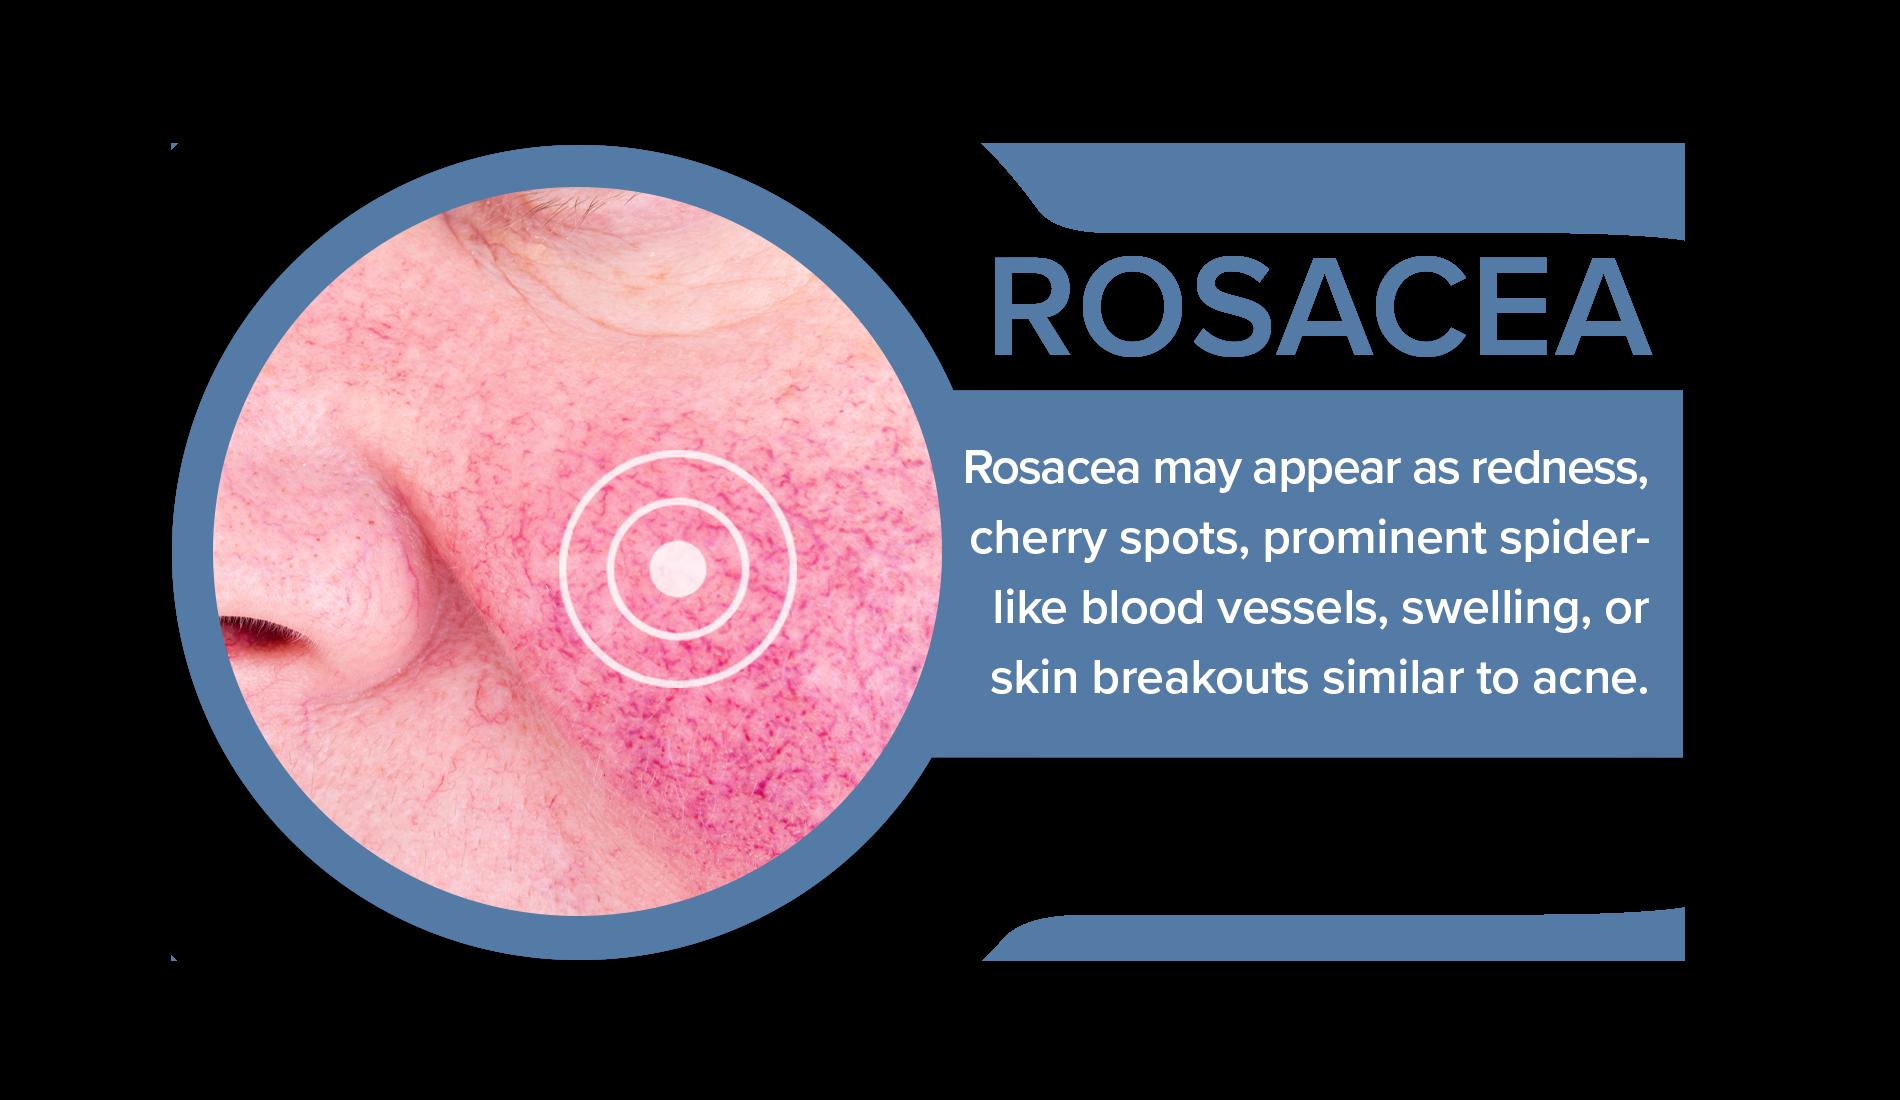 Close-up of symptoms of rosacea